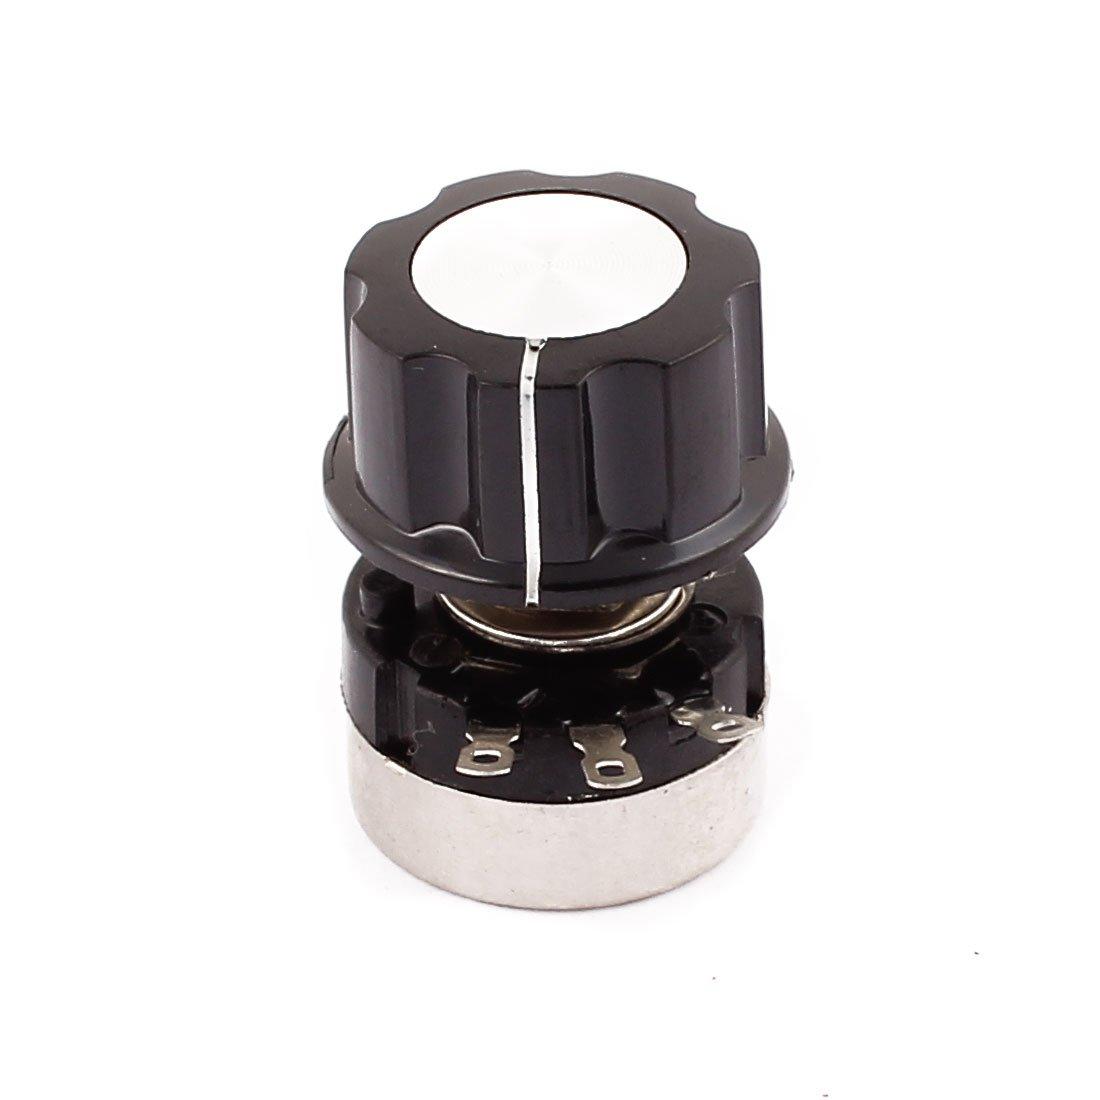 sourcingmap® RV24 B504 Rotary Carbon Film Potentiometer 500K Ohm Adjustable Resistance w Cap US-SA-AJD-202803